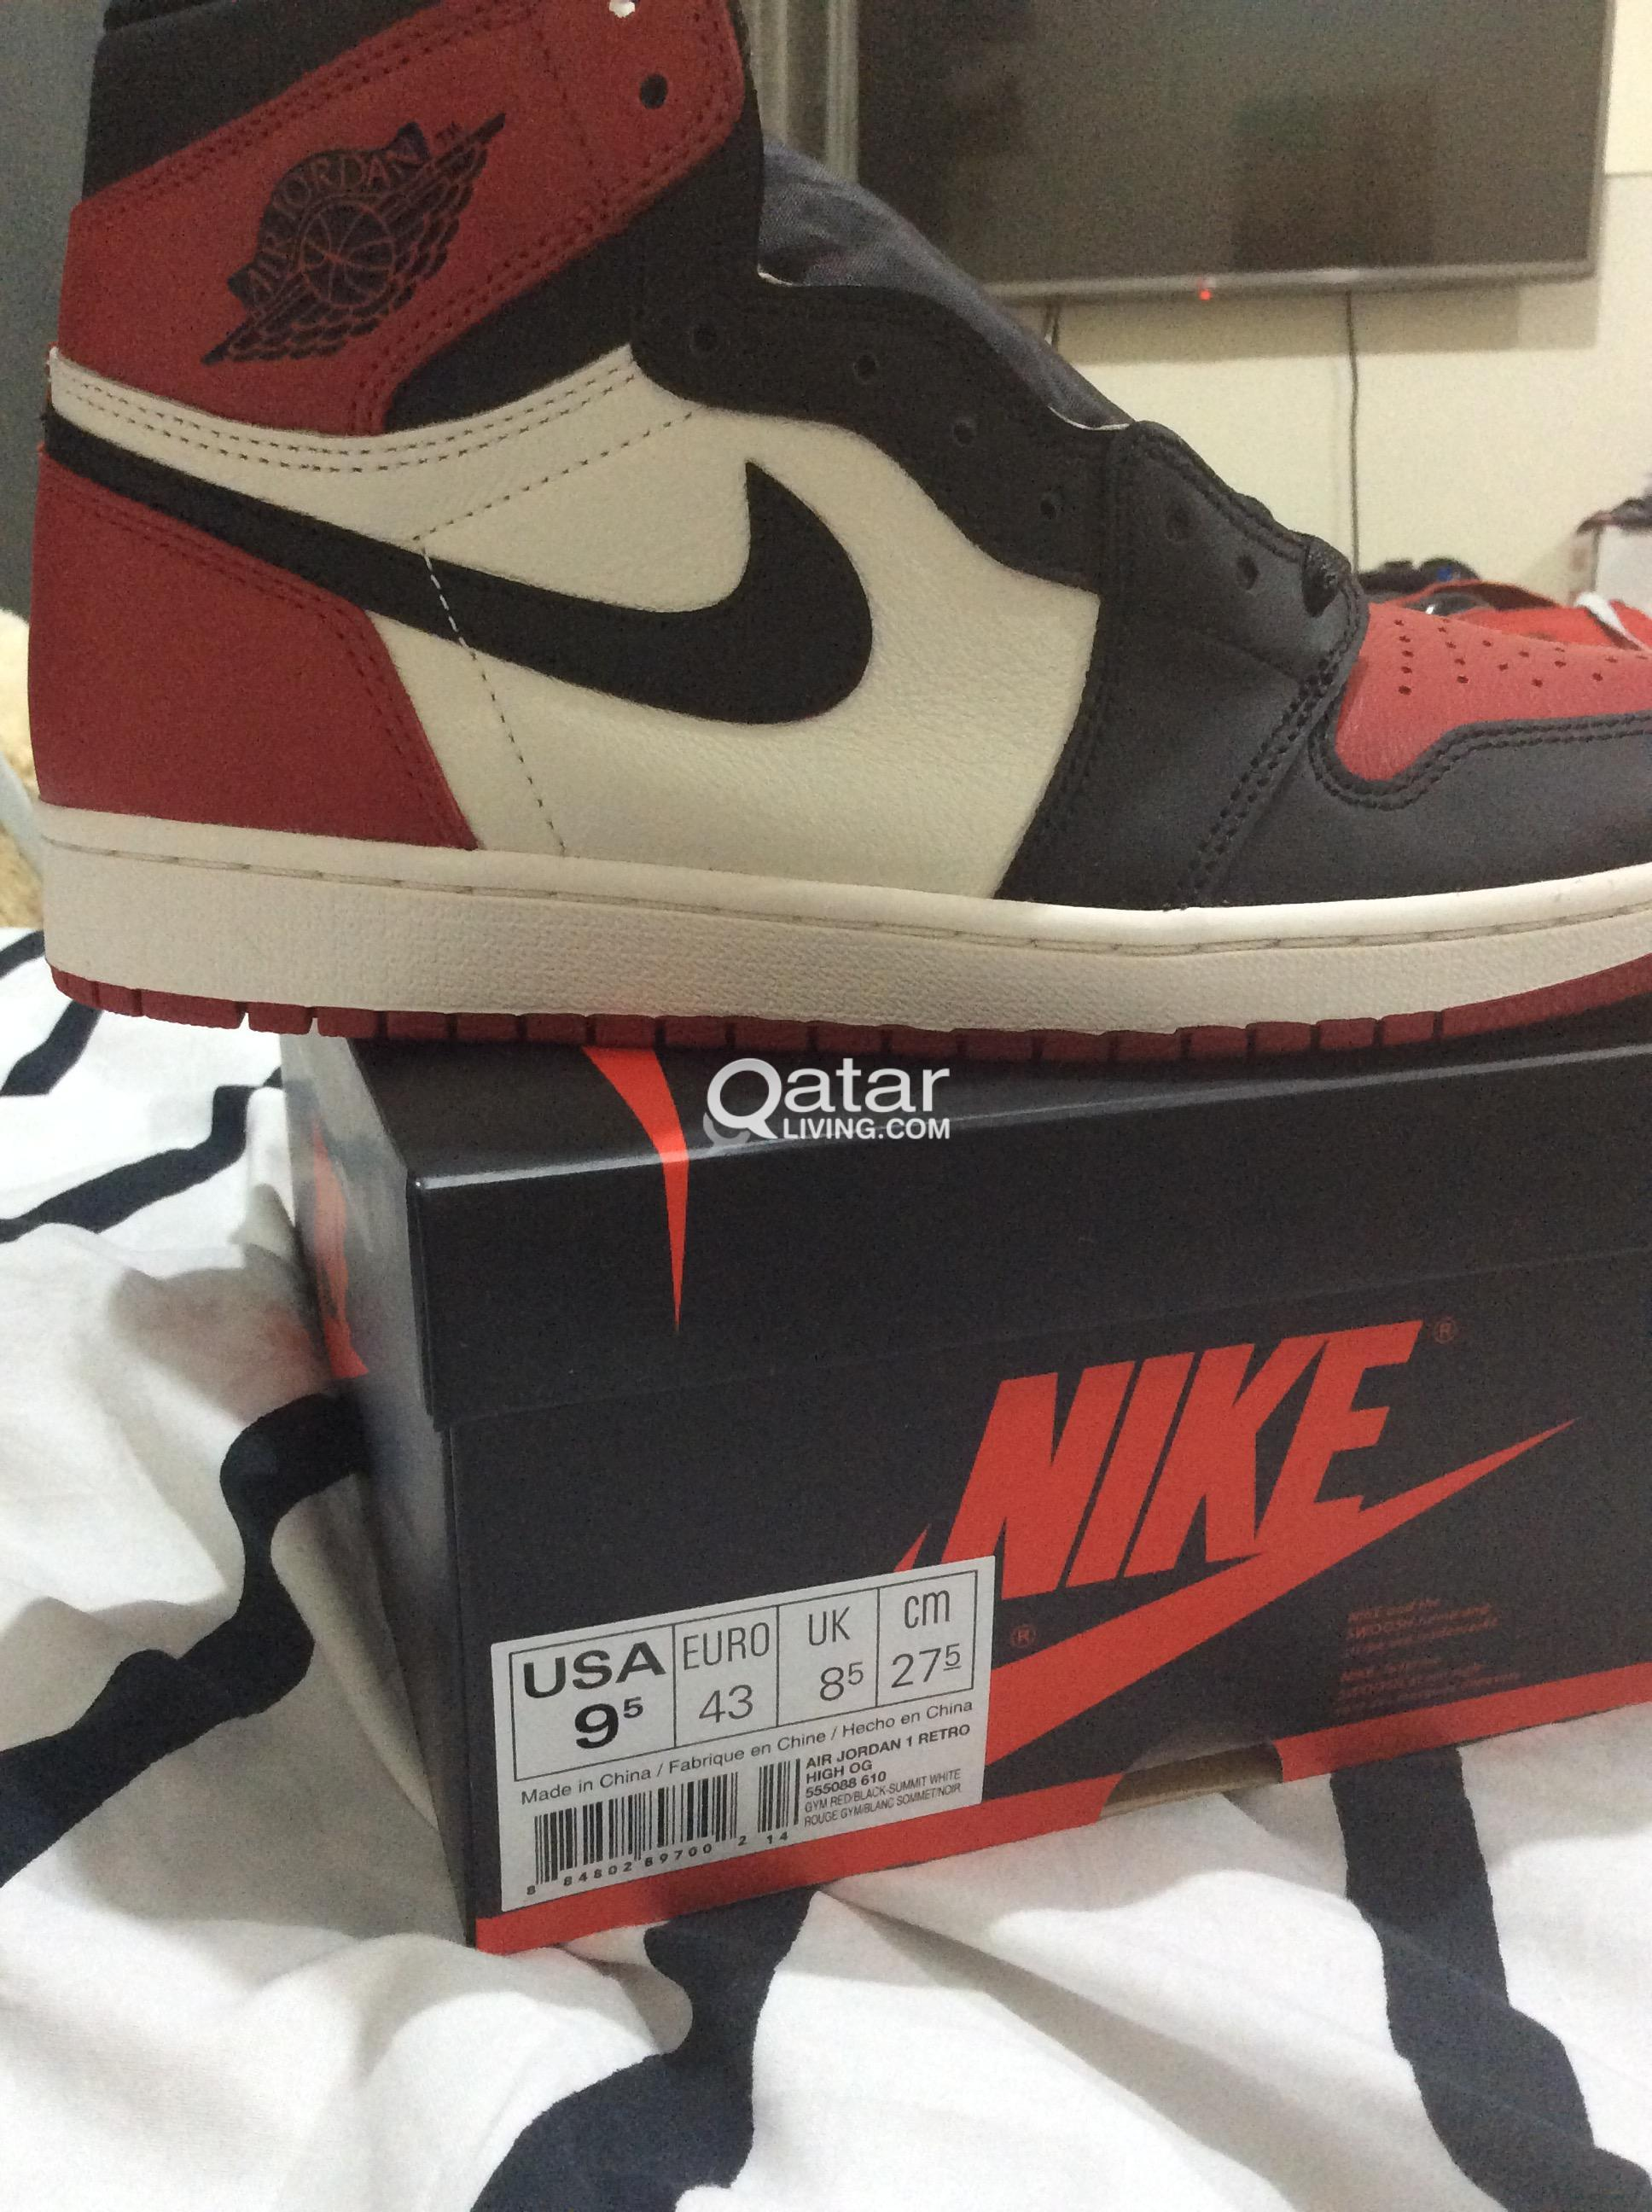 newest 21dd3 55934 Nike Air Jordan 1 Retro High Og Bred Toe- SOLD   Qatar Living